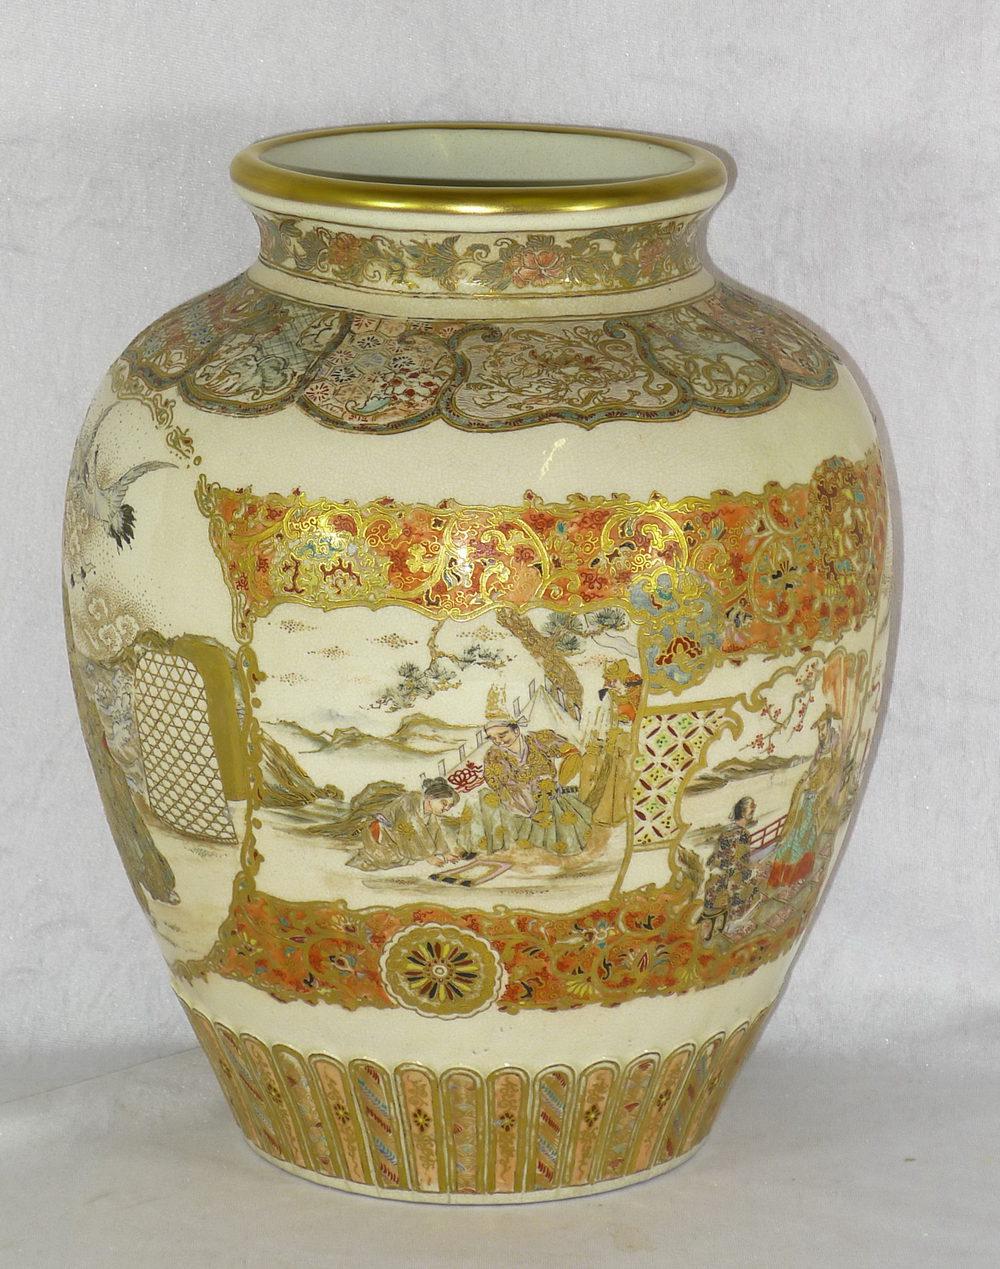 Antiques Atlas - Large 19th C Japanese Satsuma Vase